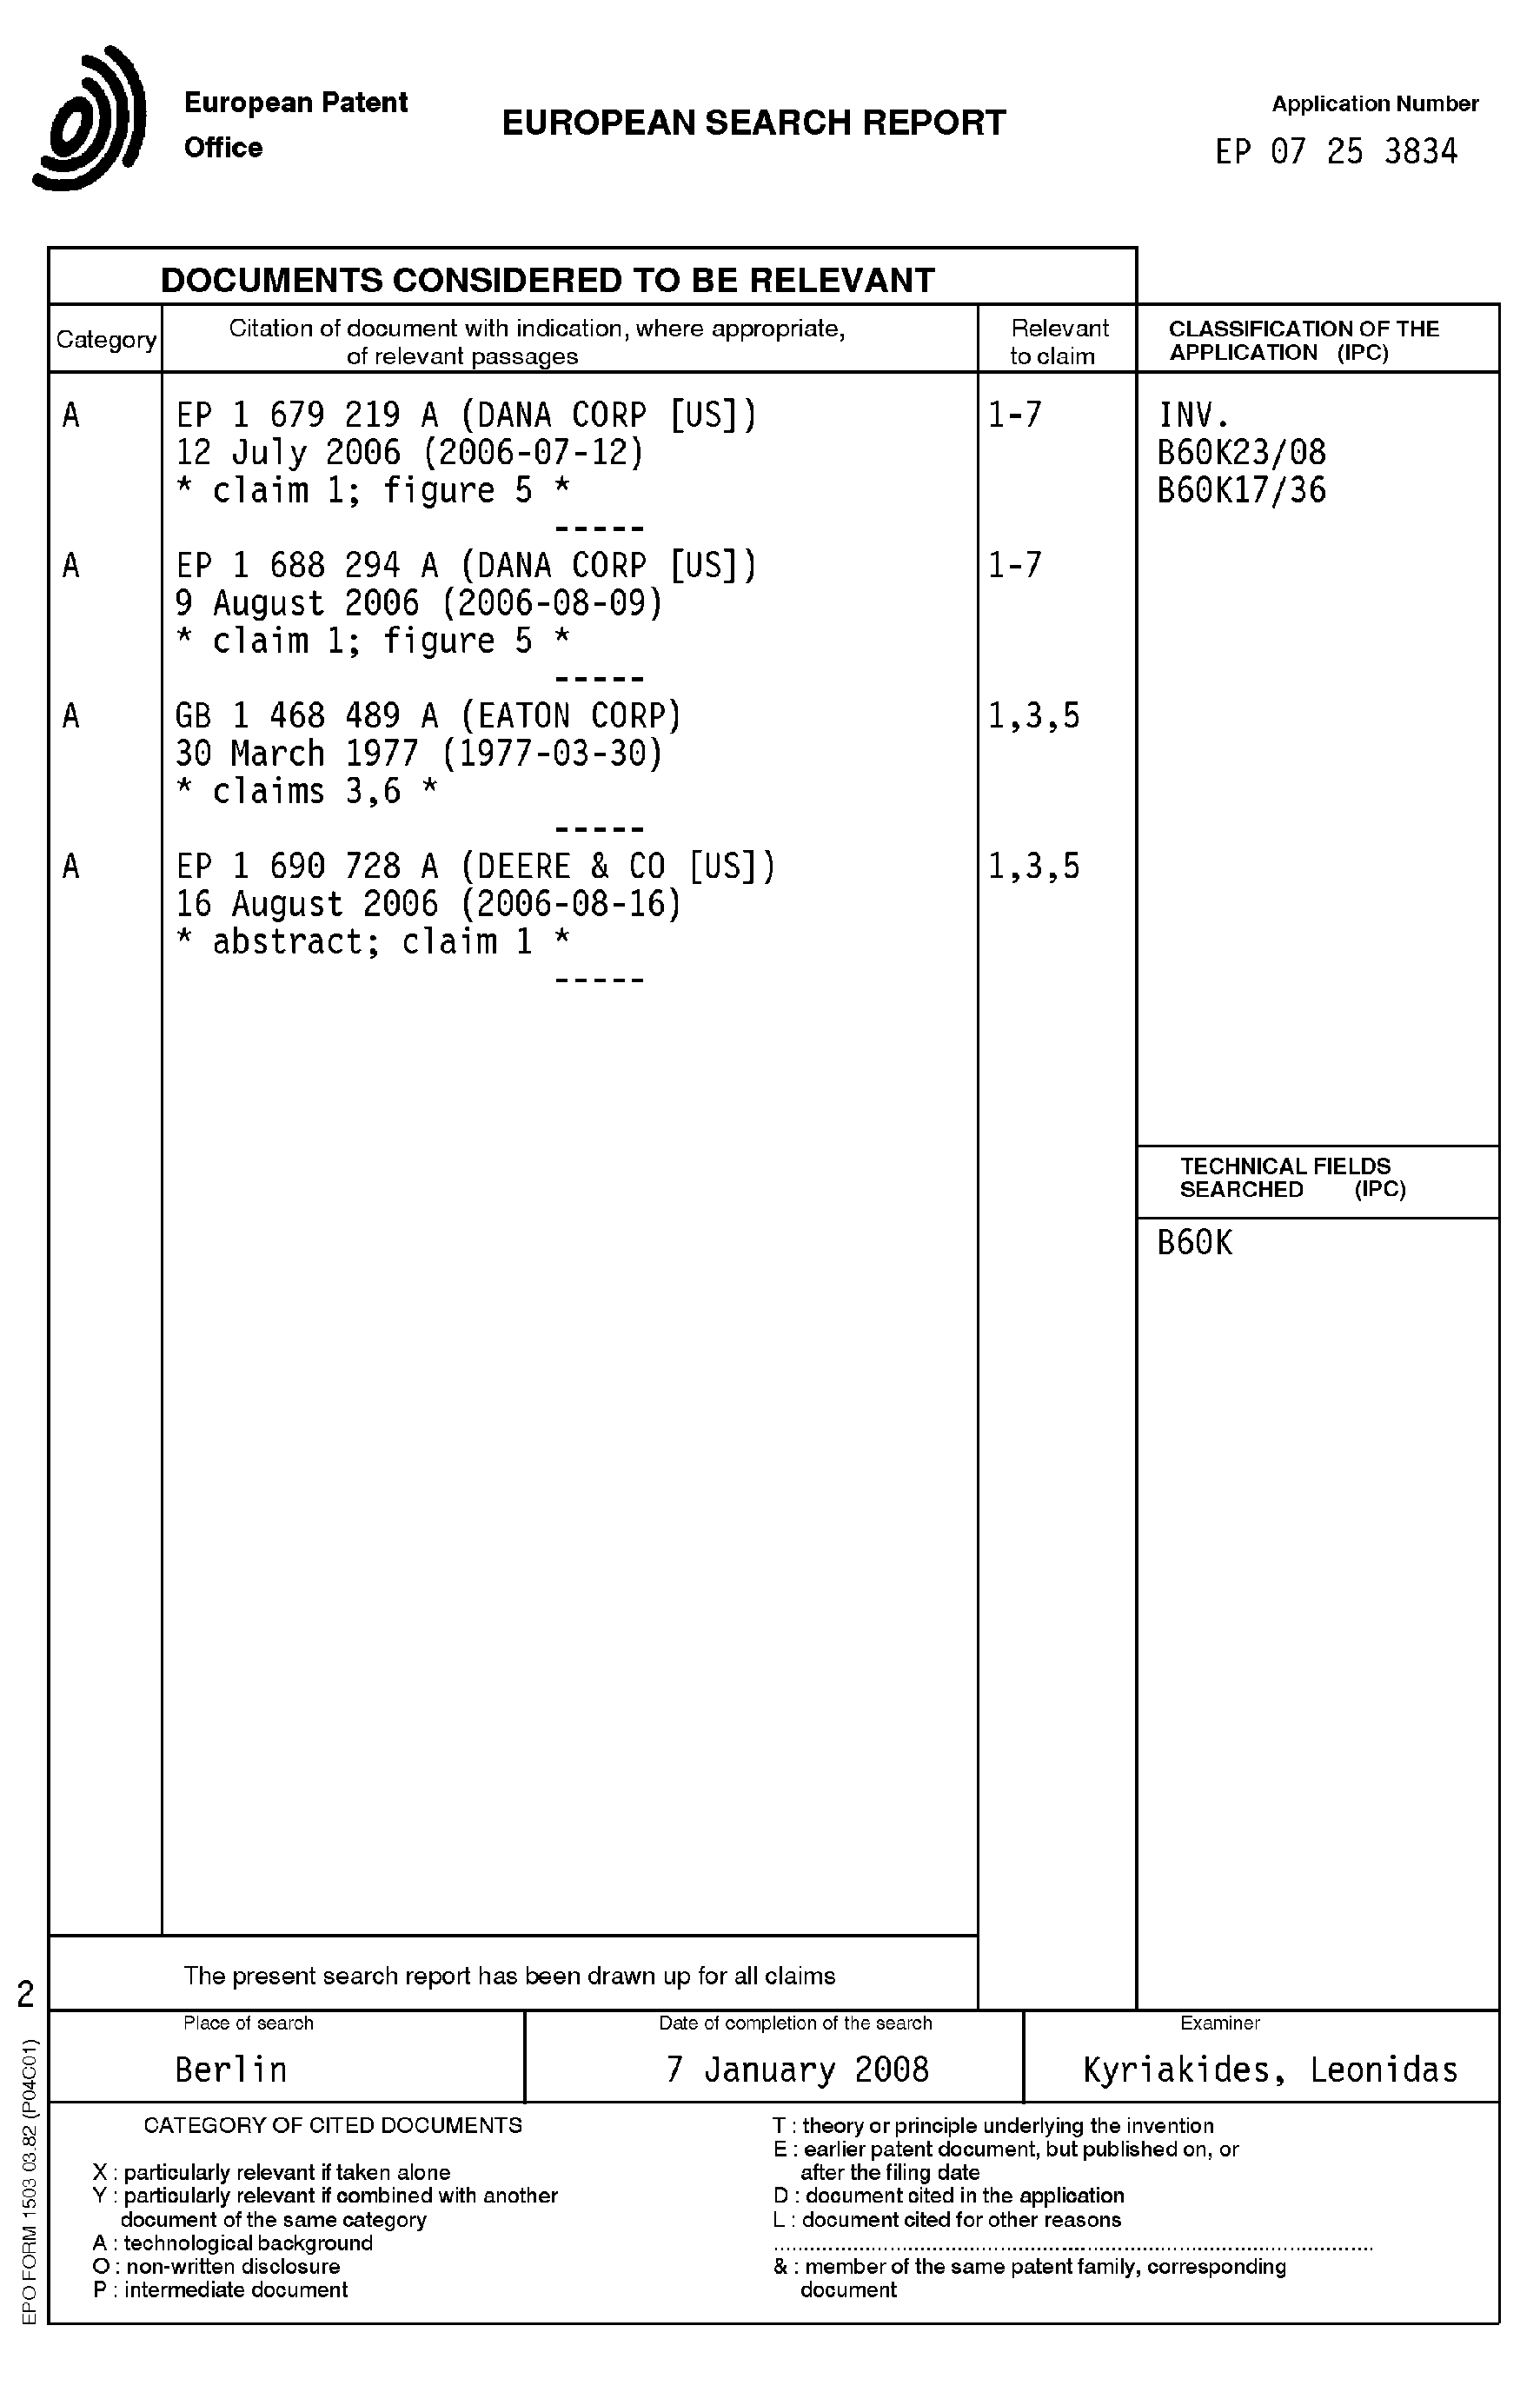 inter axle differential lock pdf